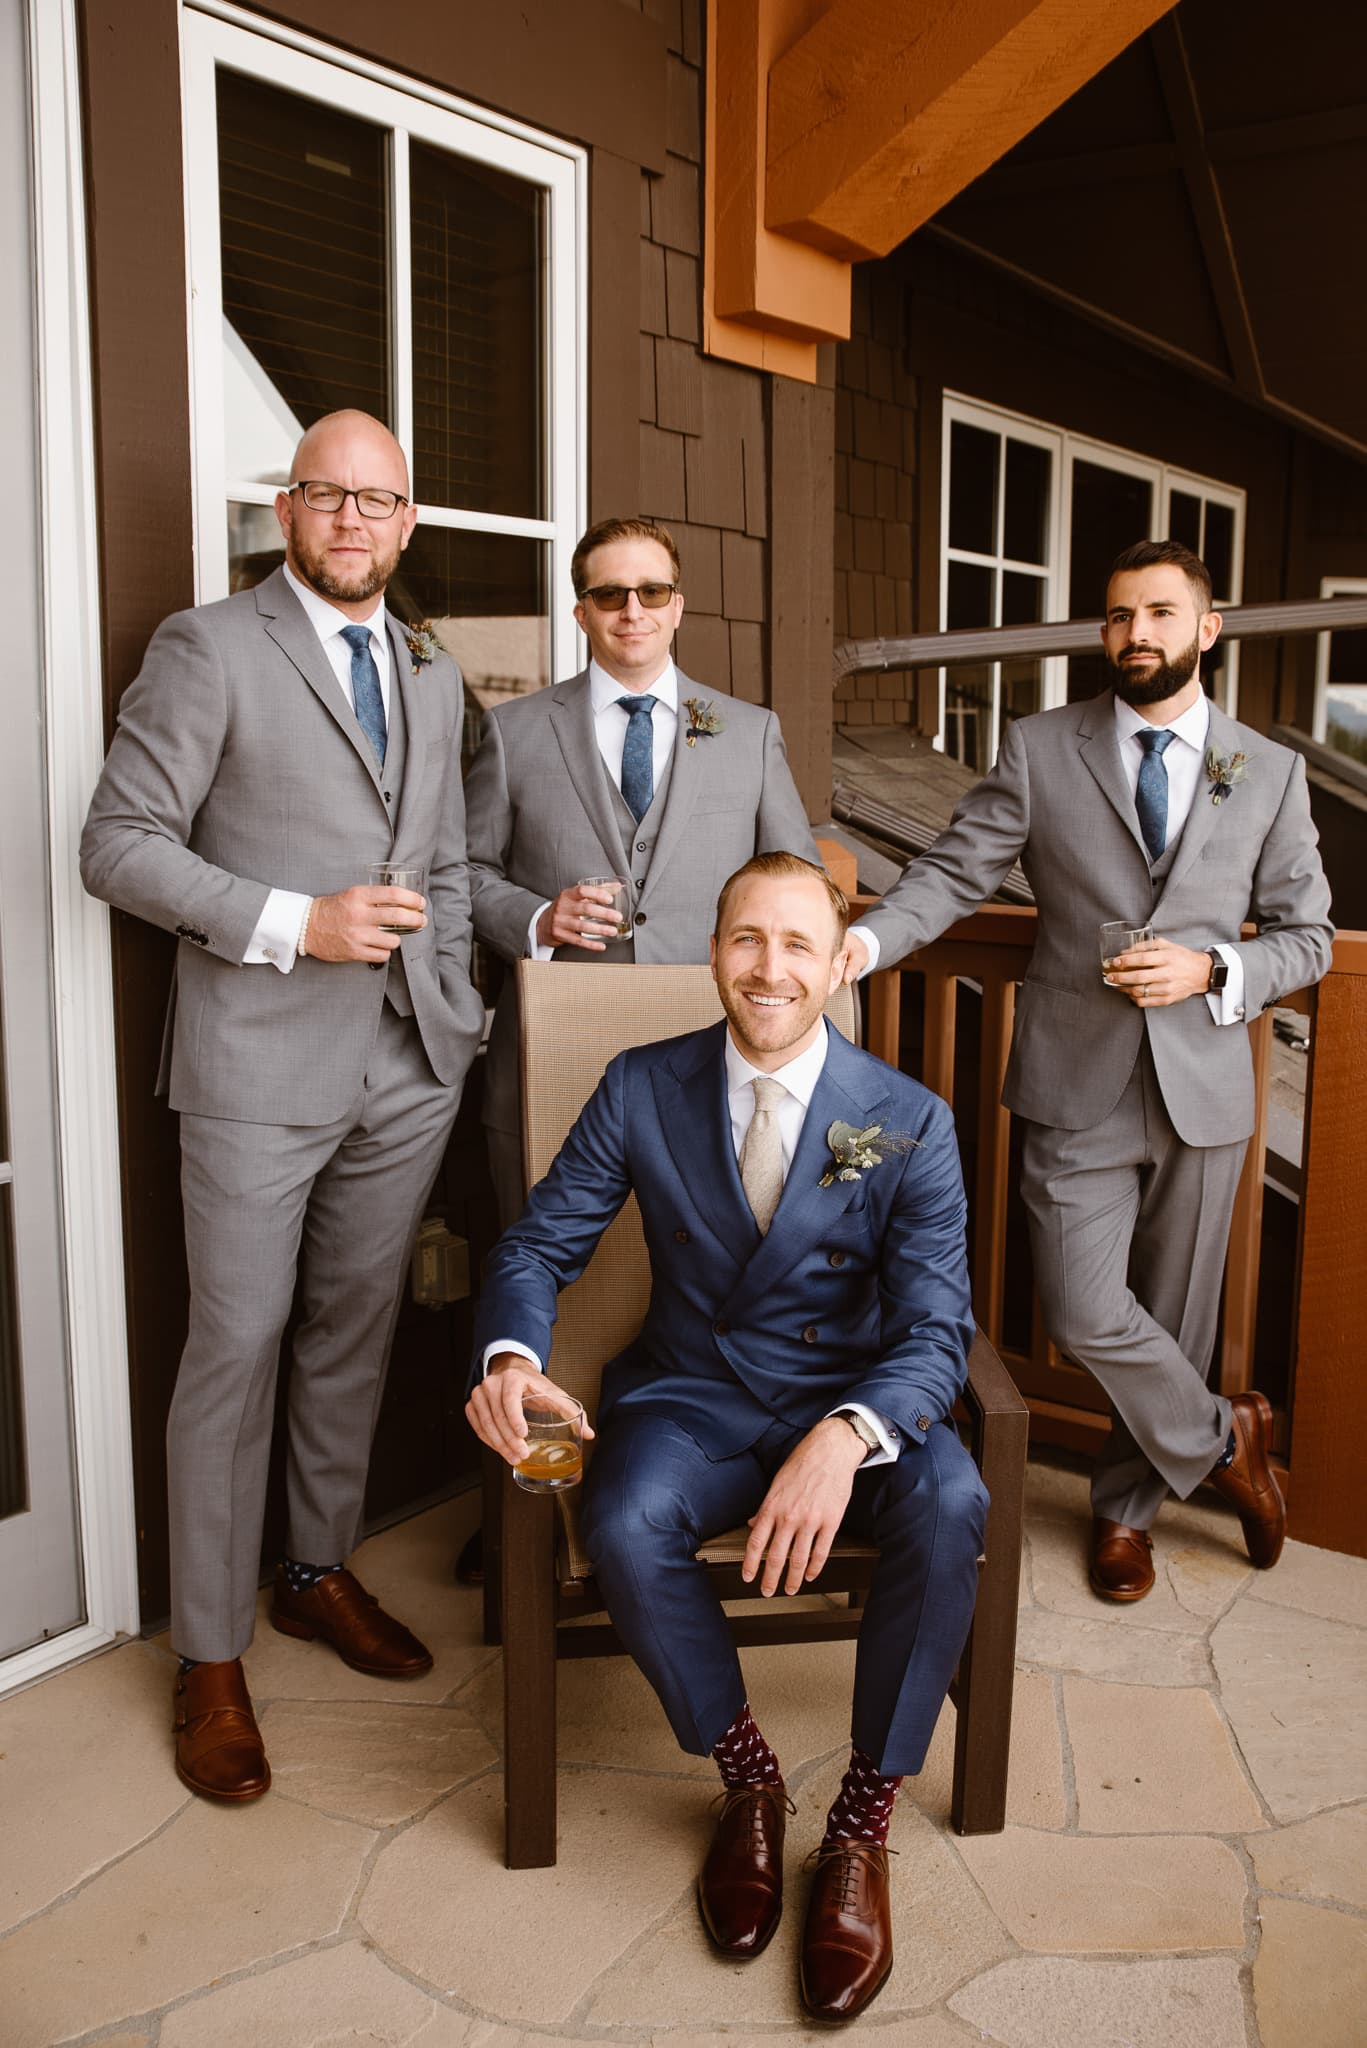 Groom with groomsmen at One Ski Hill Hotel before Breckenridge Nordic Center wedding